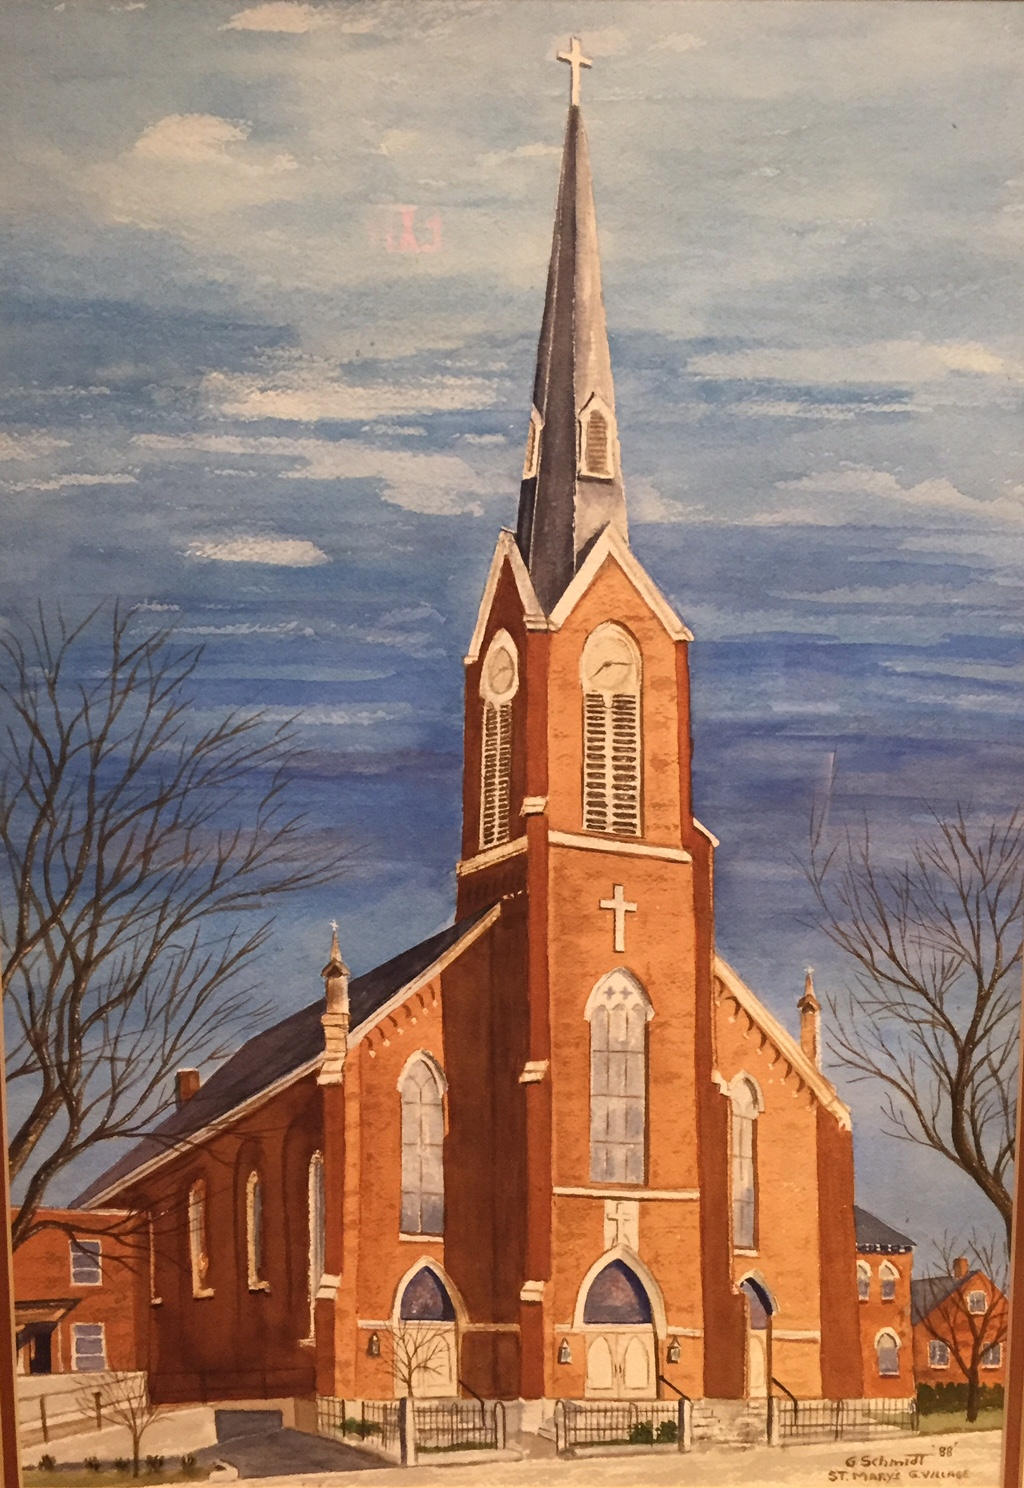 St. Mary Church Painting George Schmidt.jpg